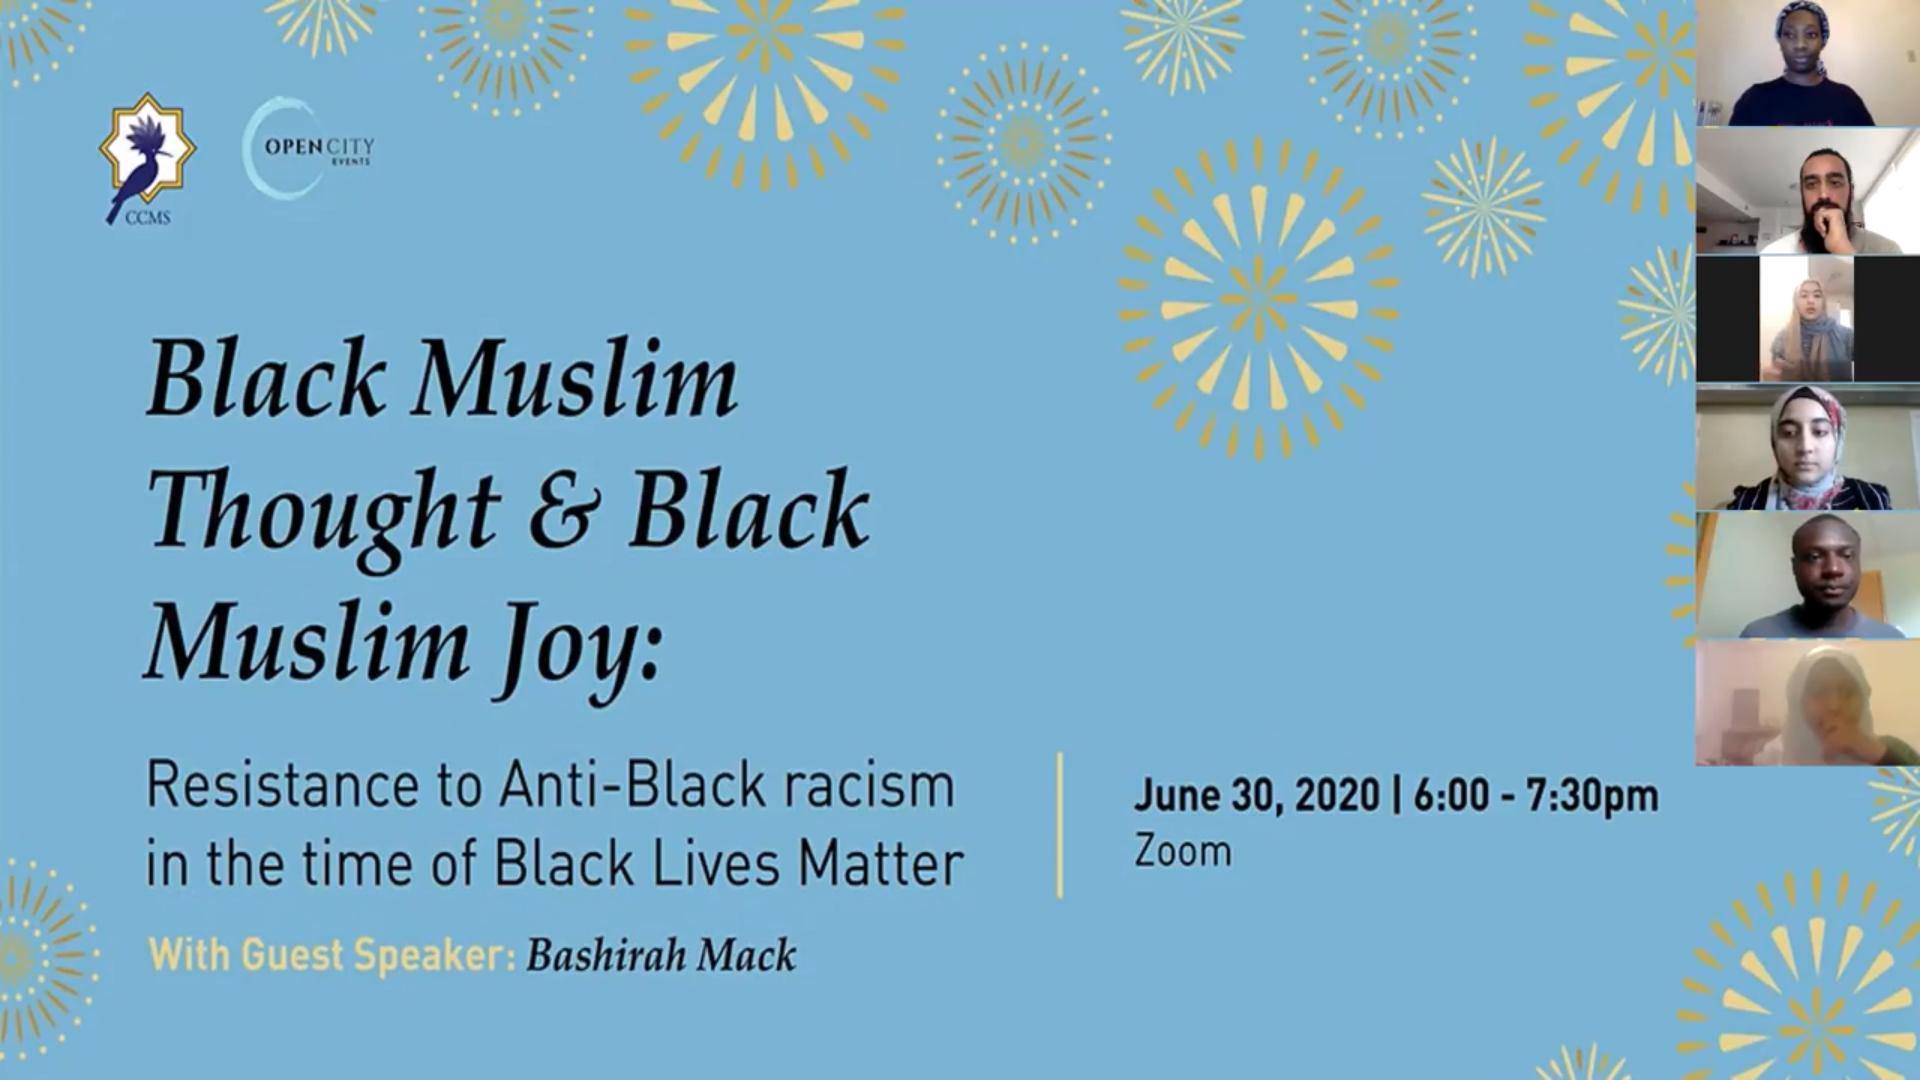 Black Muslim Thought